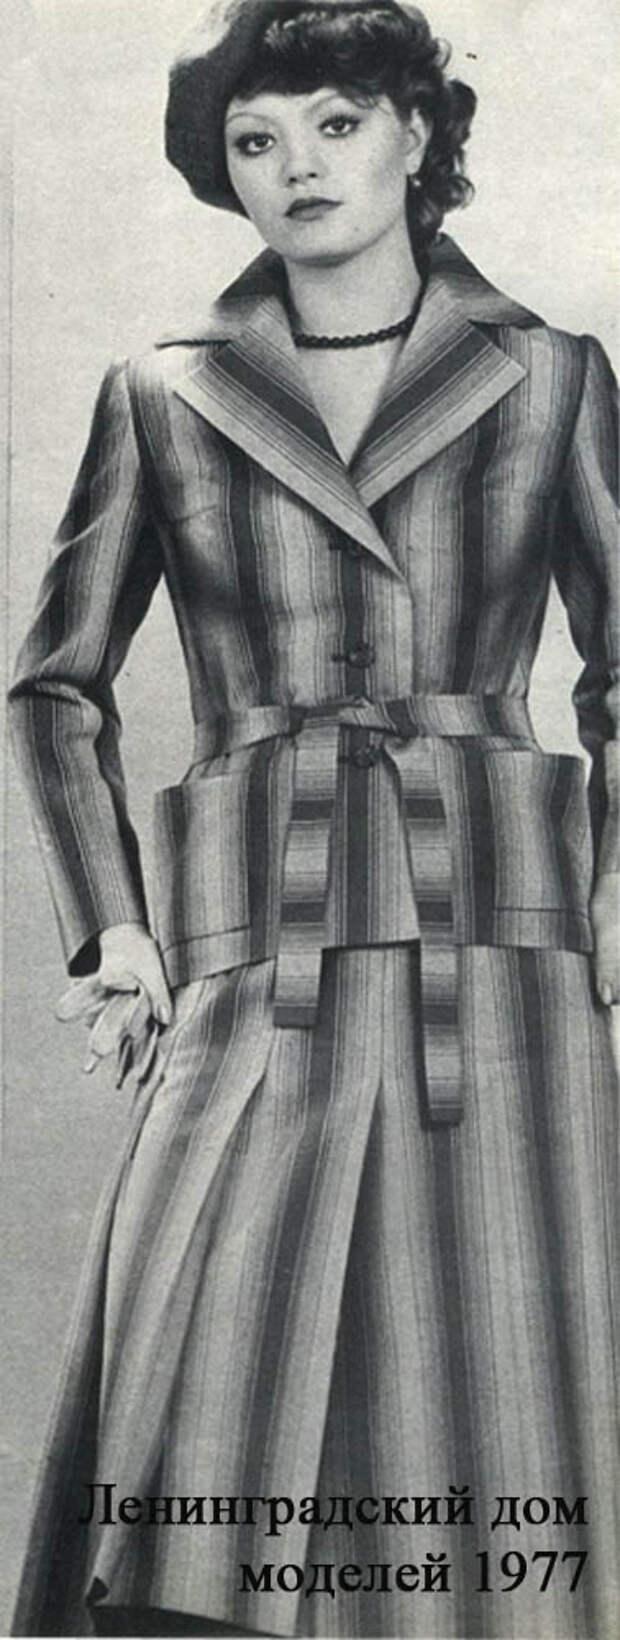 Мода 1977-1